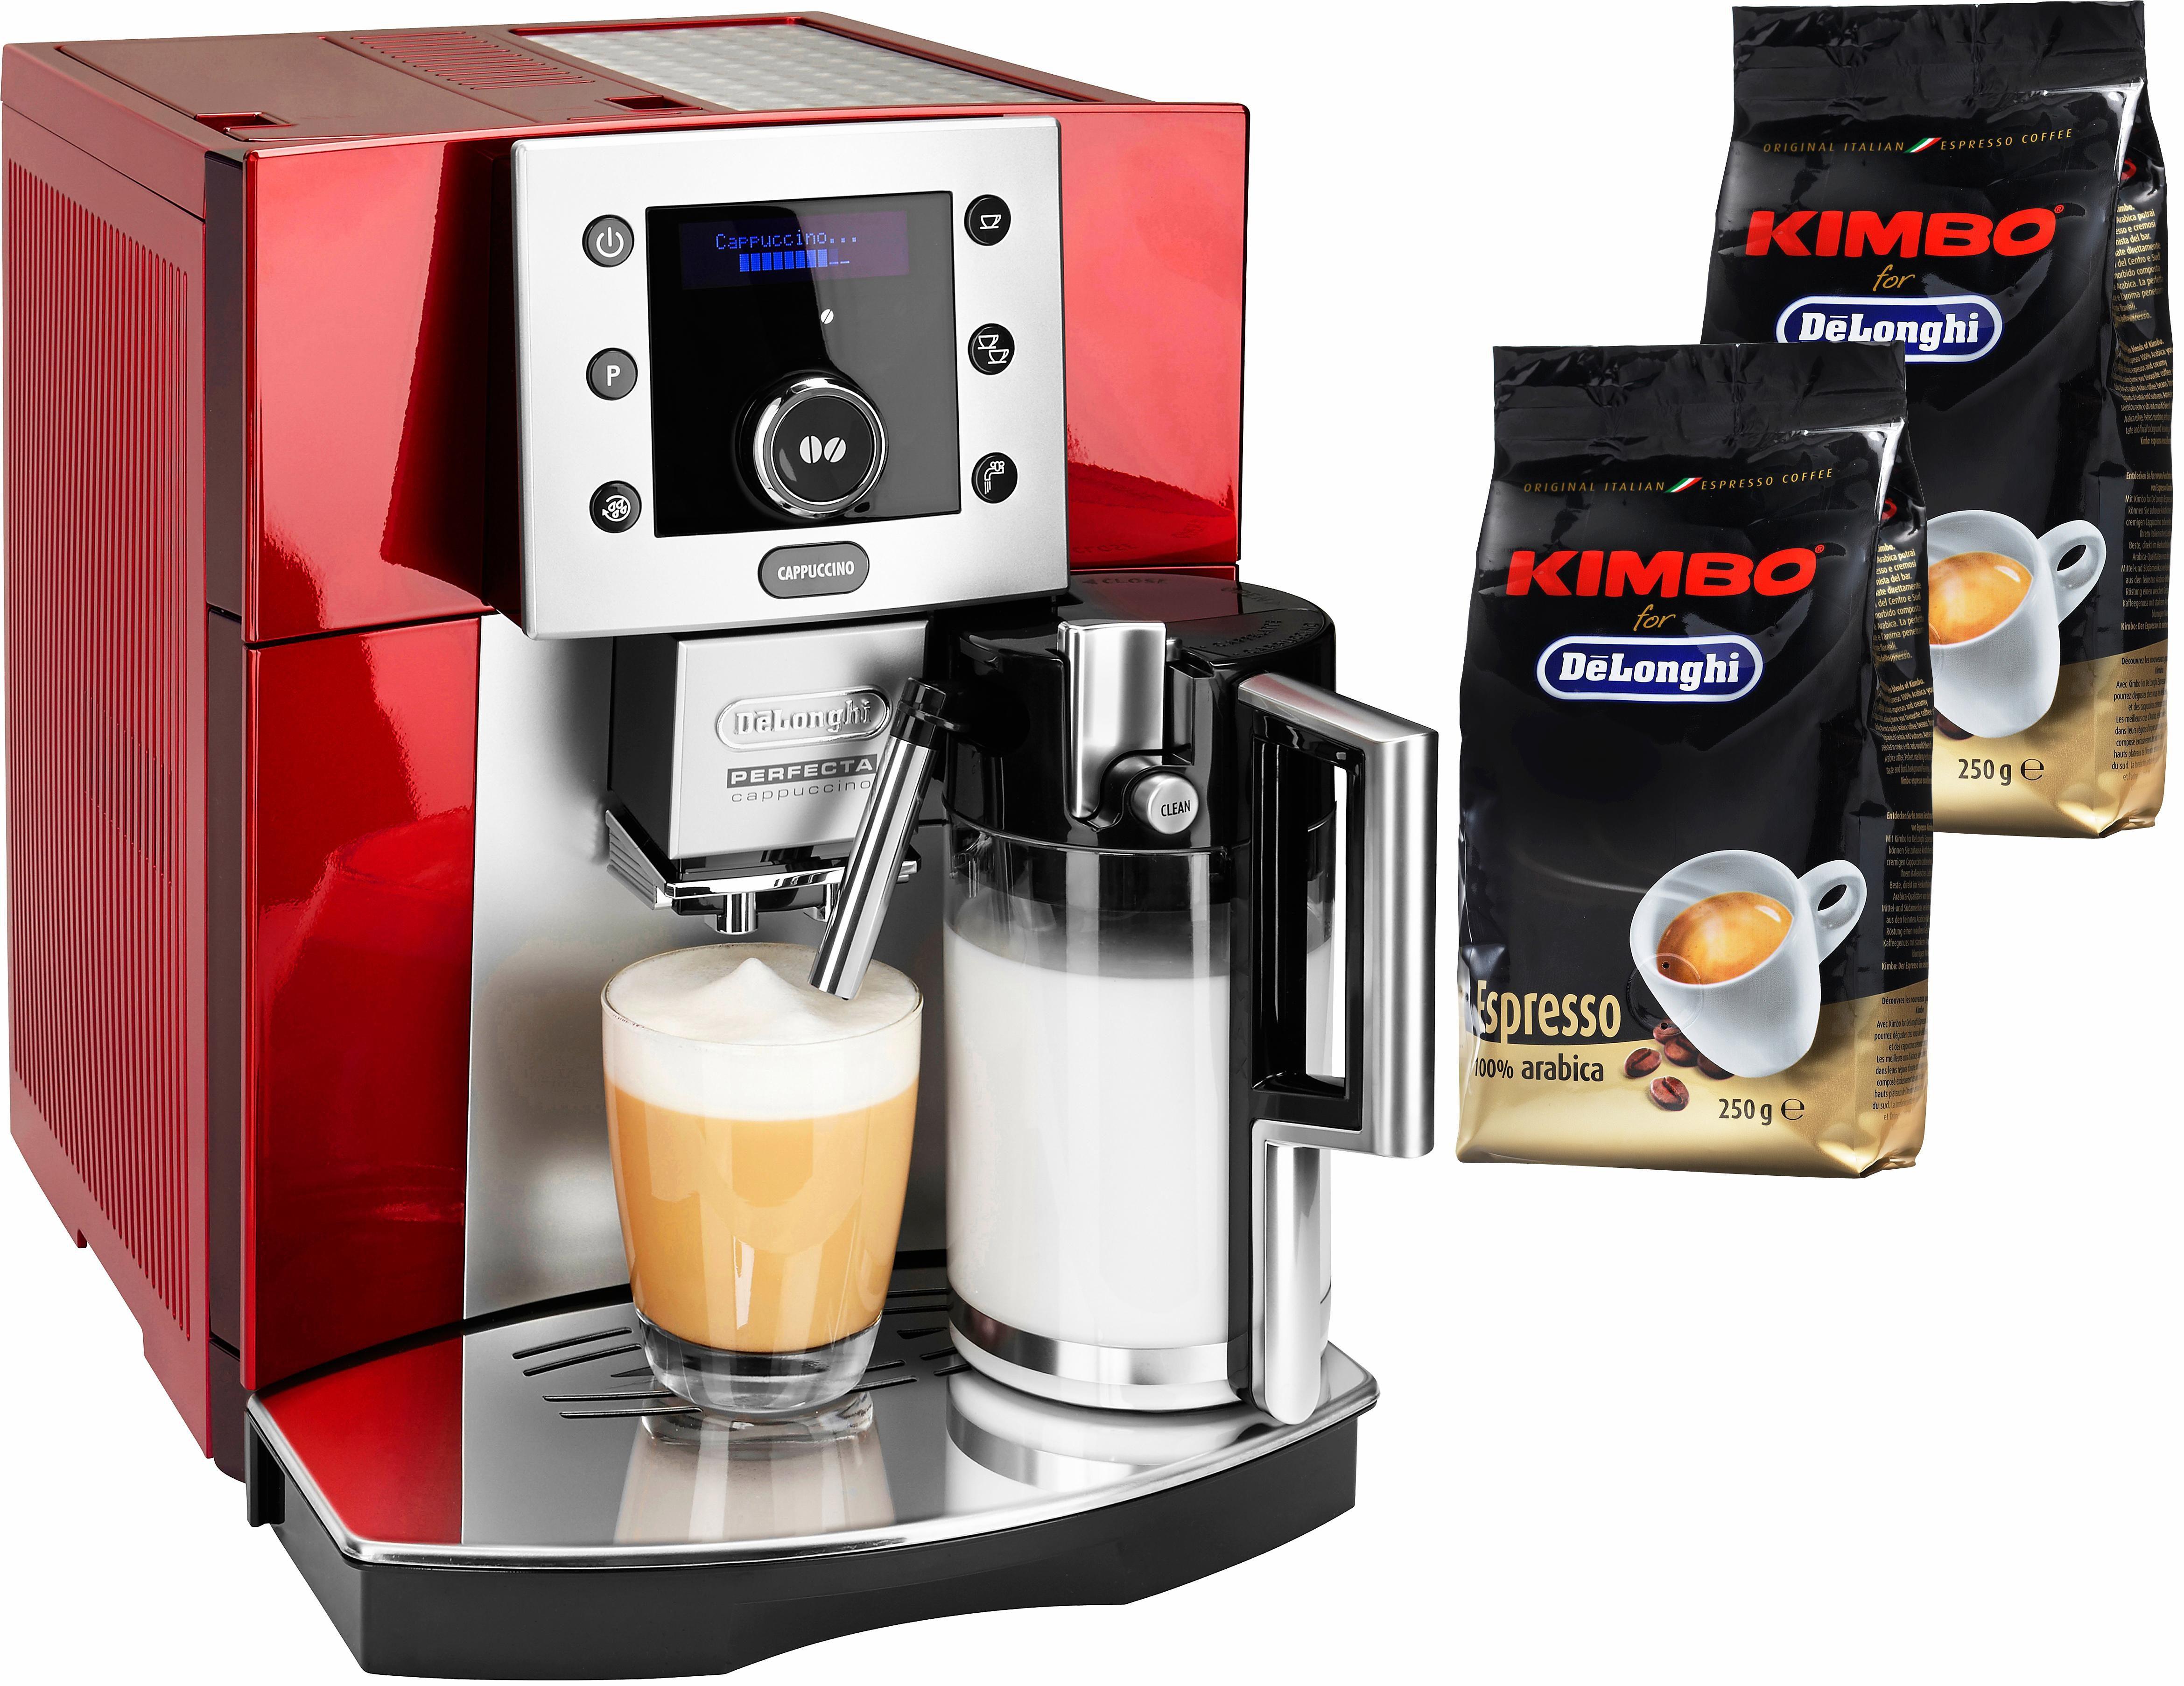 De´Longhi Kaffeevollautomat Perfecta ESAM 5550.R, 1,7l Tank, Kegelmahlwerk | Küche und Esszimmer > Kaffee und Tee > Kaffeevollautomaten | Rot | DELONGHI